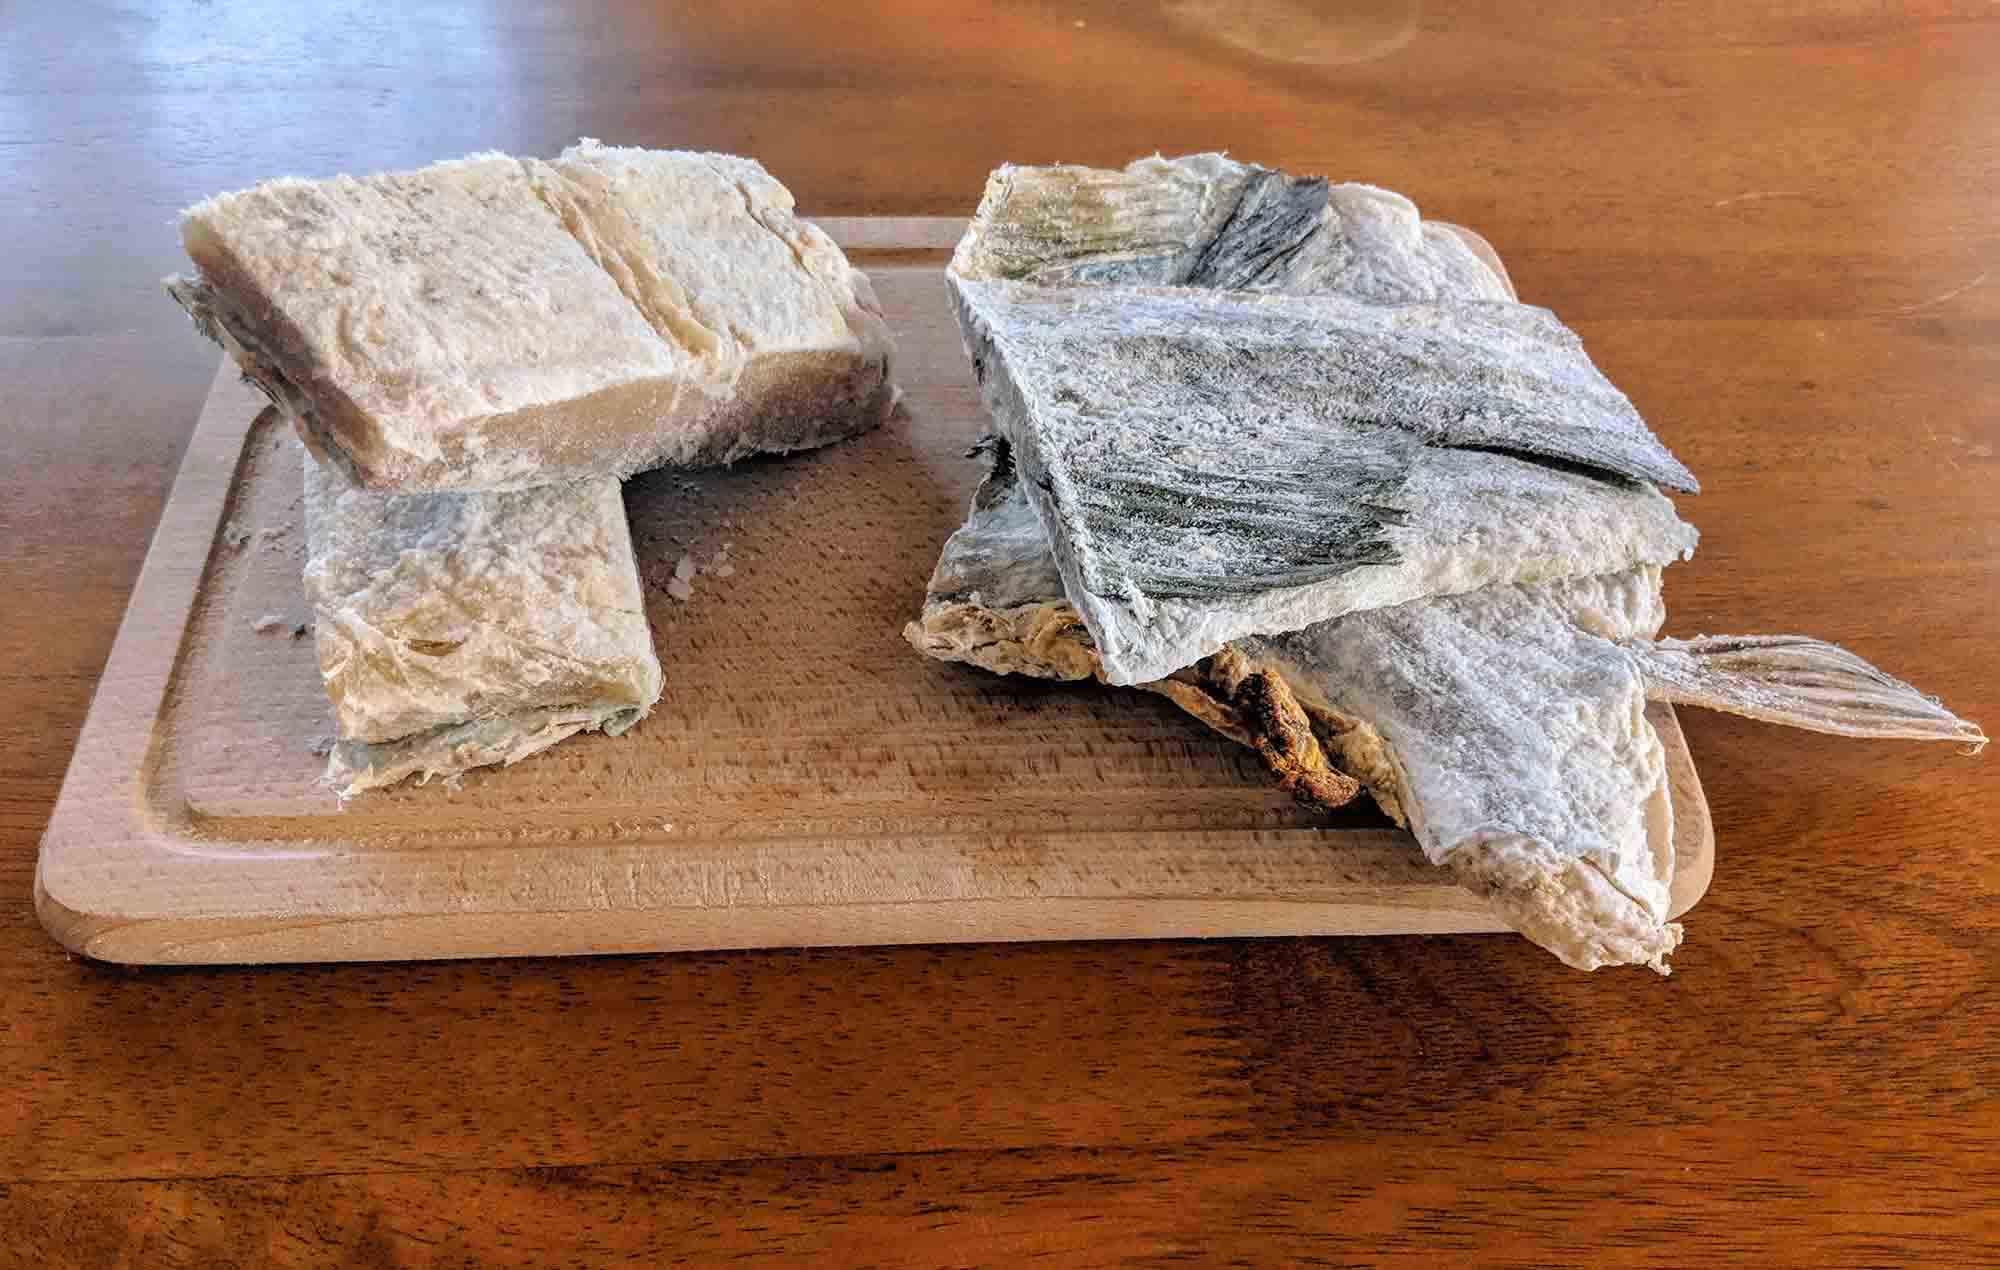 bacalhau pieces